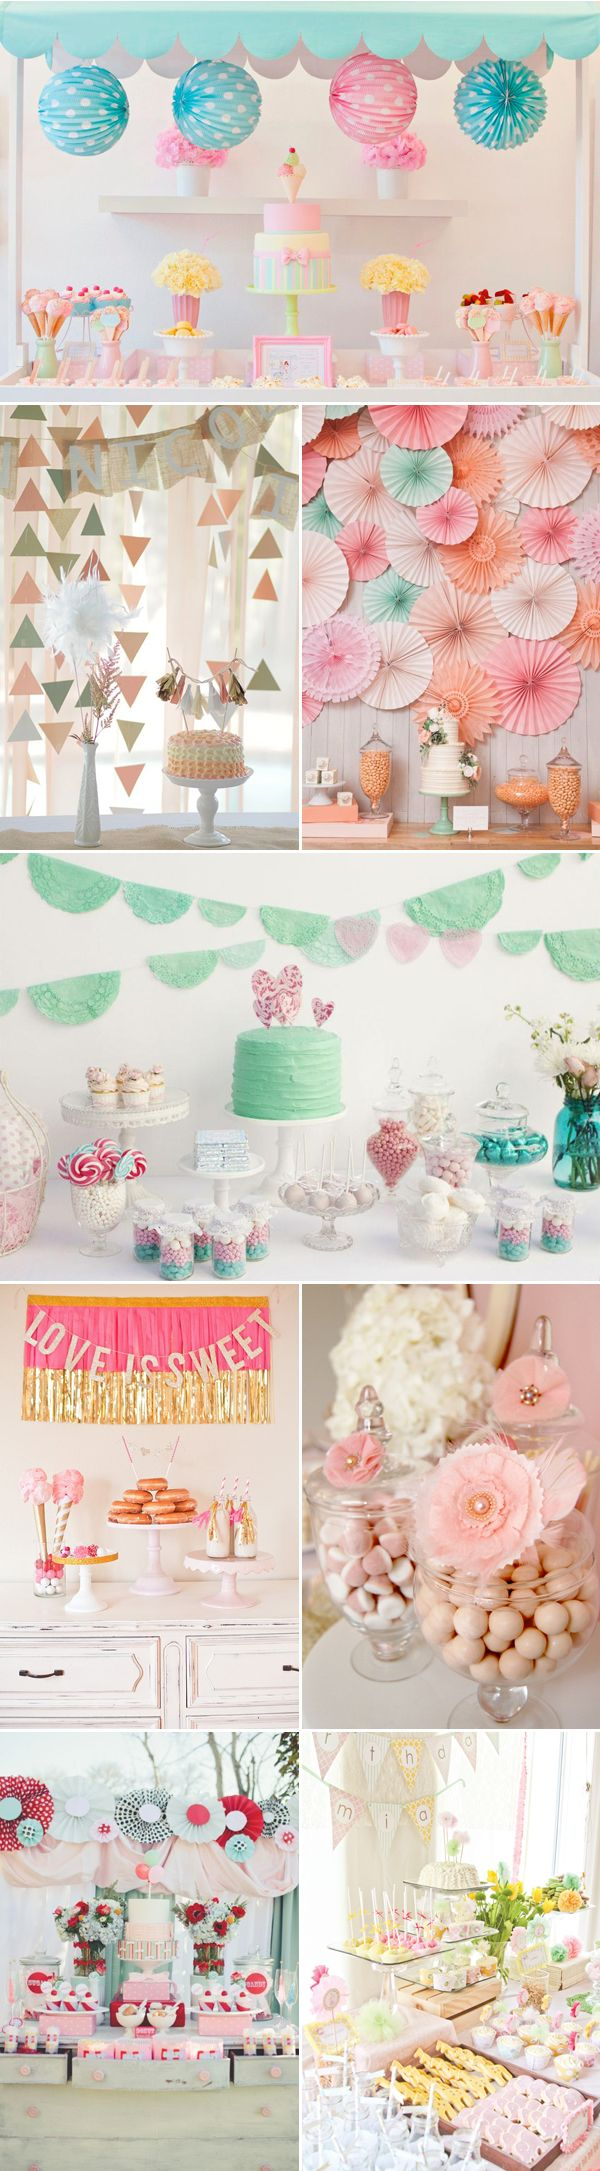 21 Adorable Dessert Table Ideas